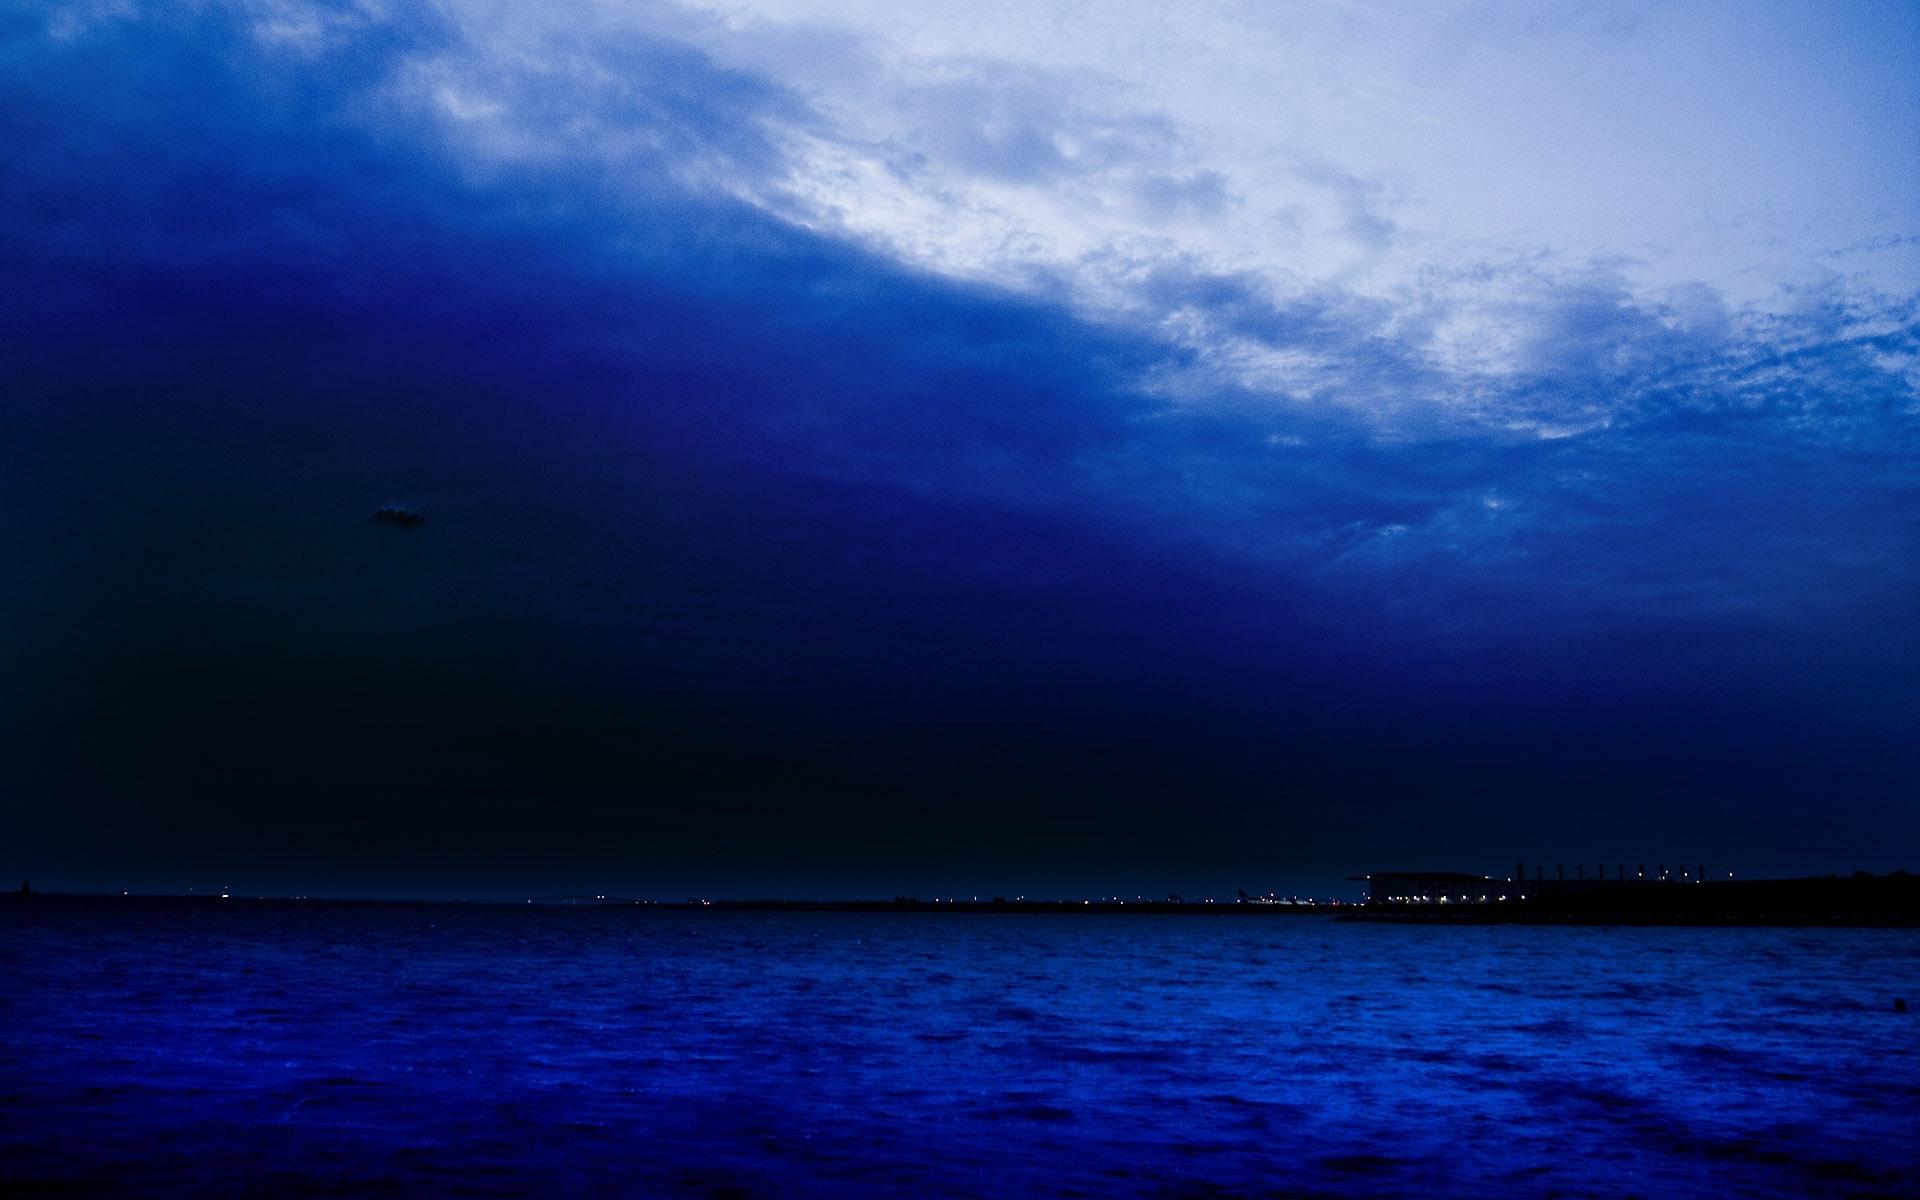 sea ocean coast shore night lights sky clouds wallpaper background 1920x1200